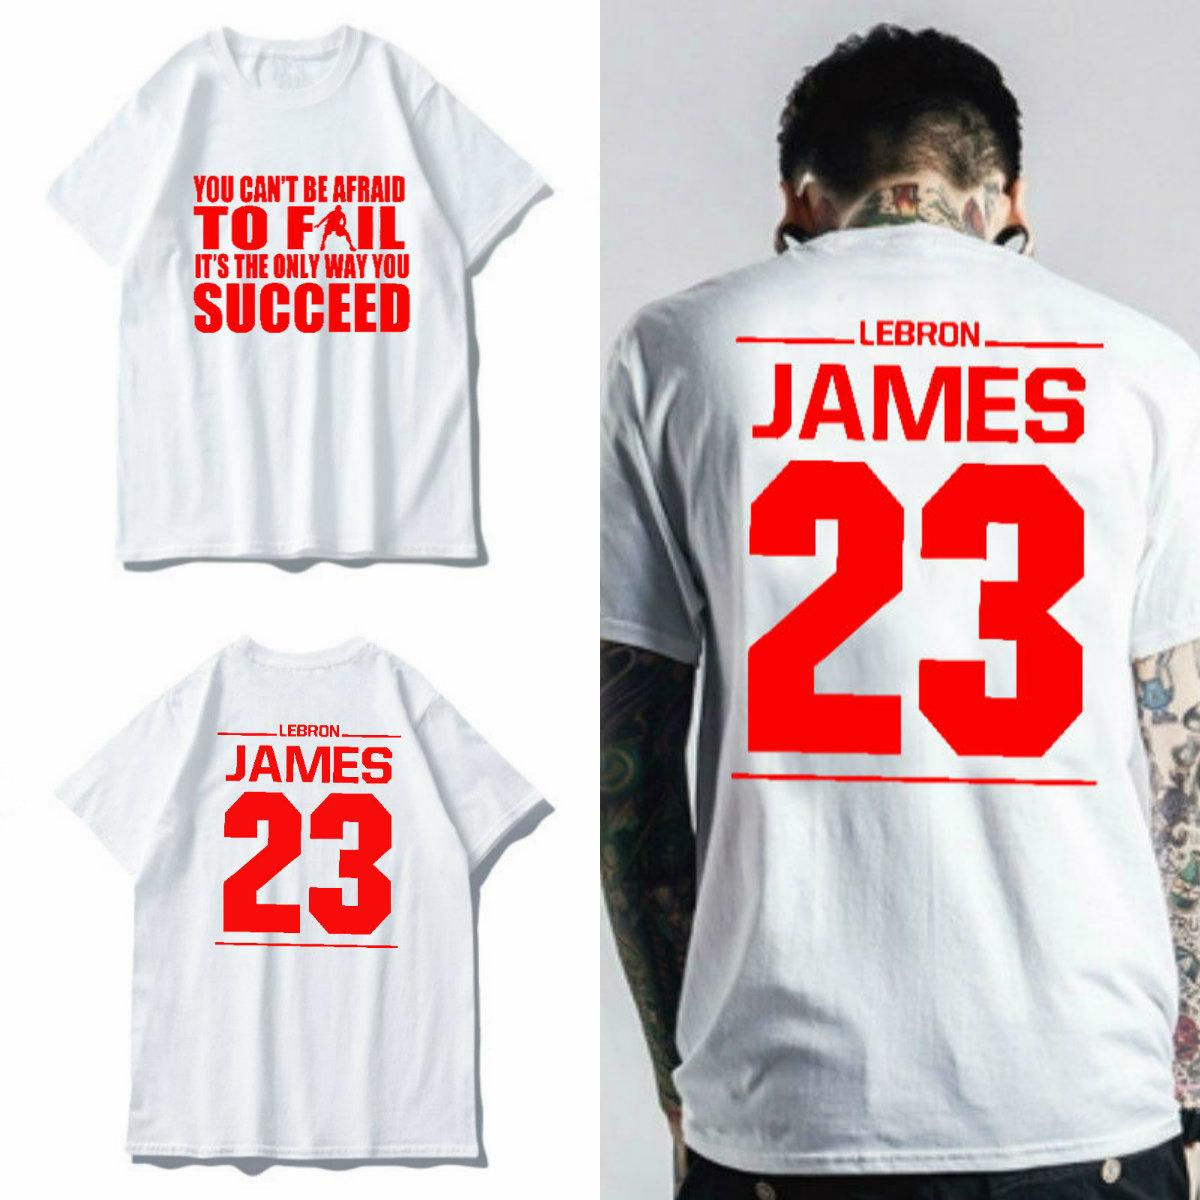 965b3a60c37b Lebron James  23 Inspirational Quotes T Shirts Men Summer Fashion Short  Sleeve O Neck Basketball Jersey And T Shirt T Shirt Makes From Luckycarol